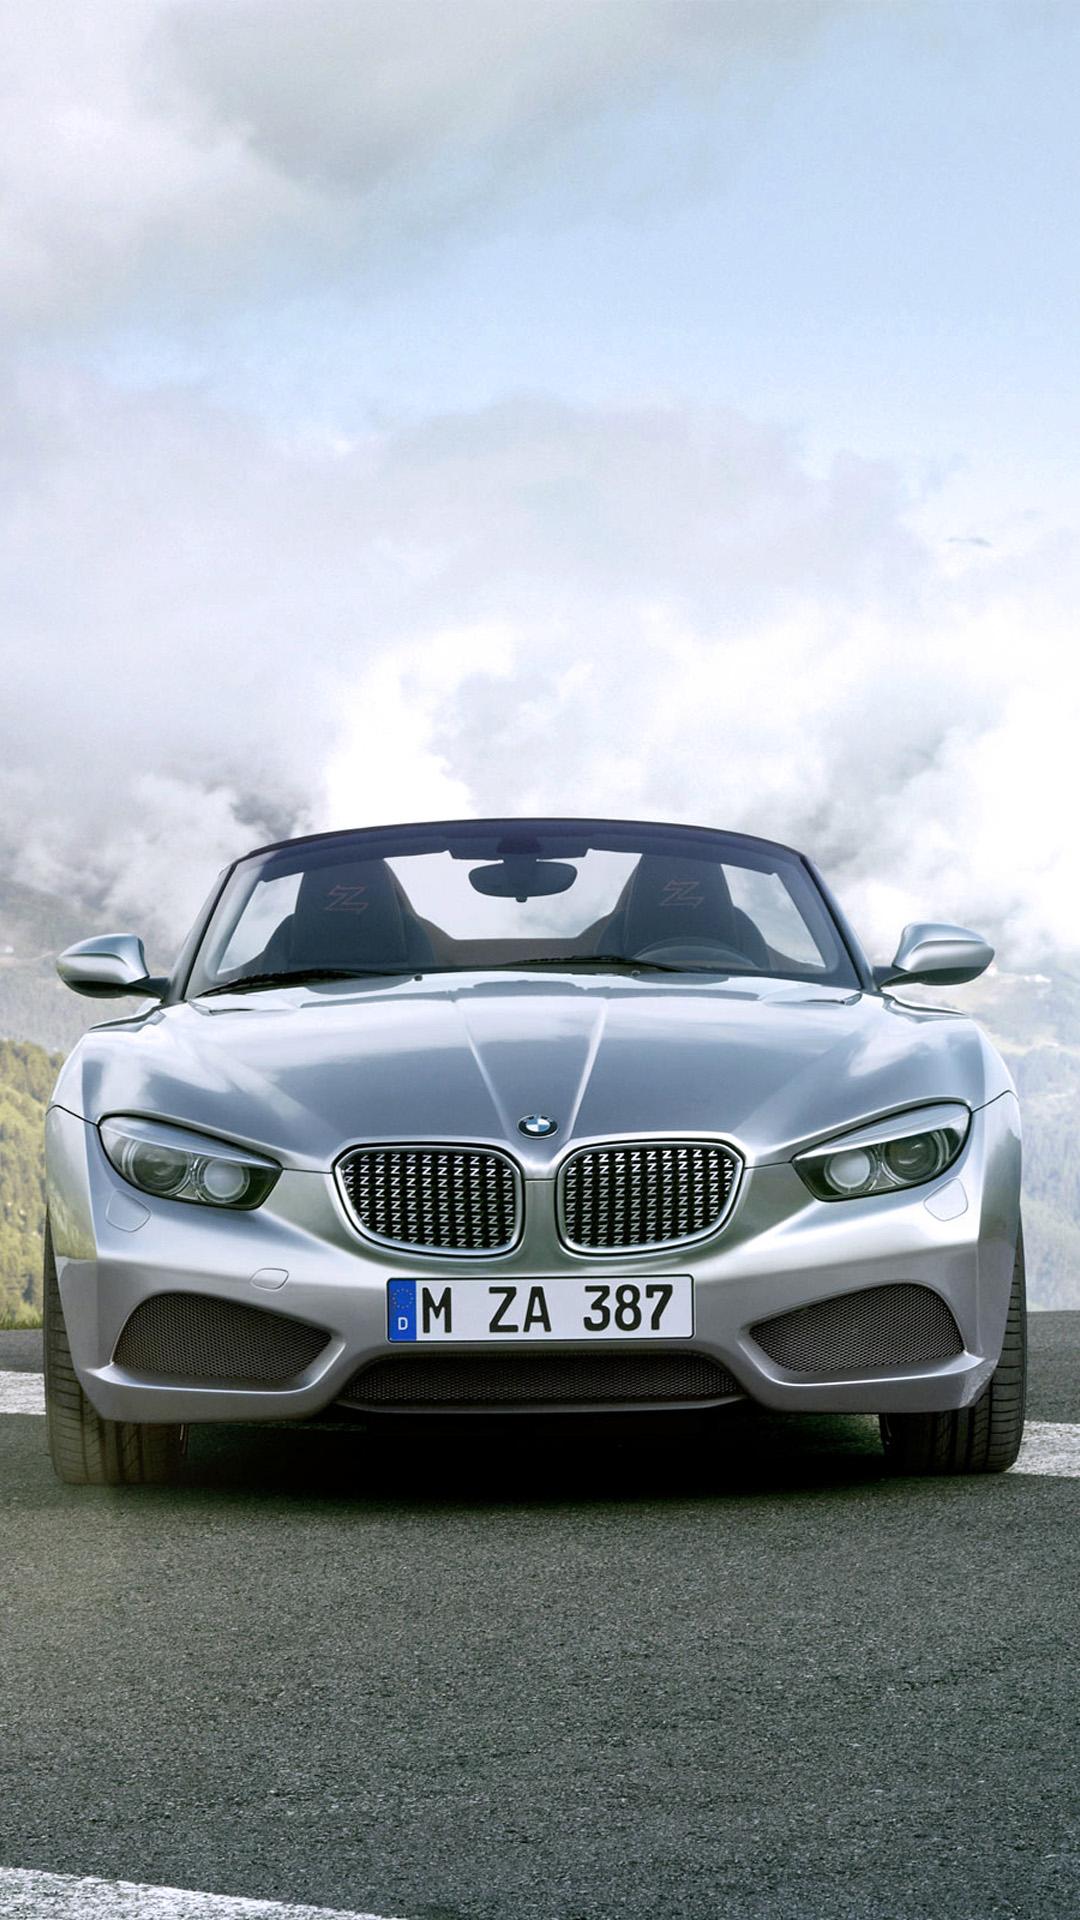 The New BMW Sports Car